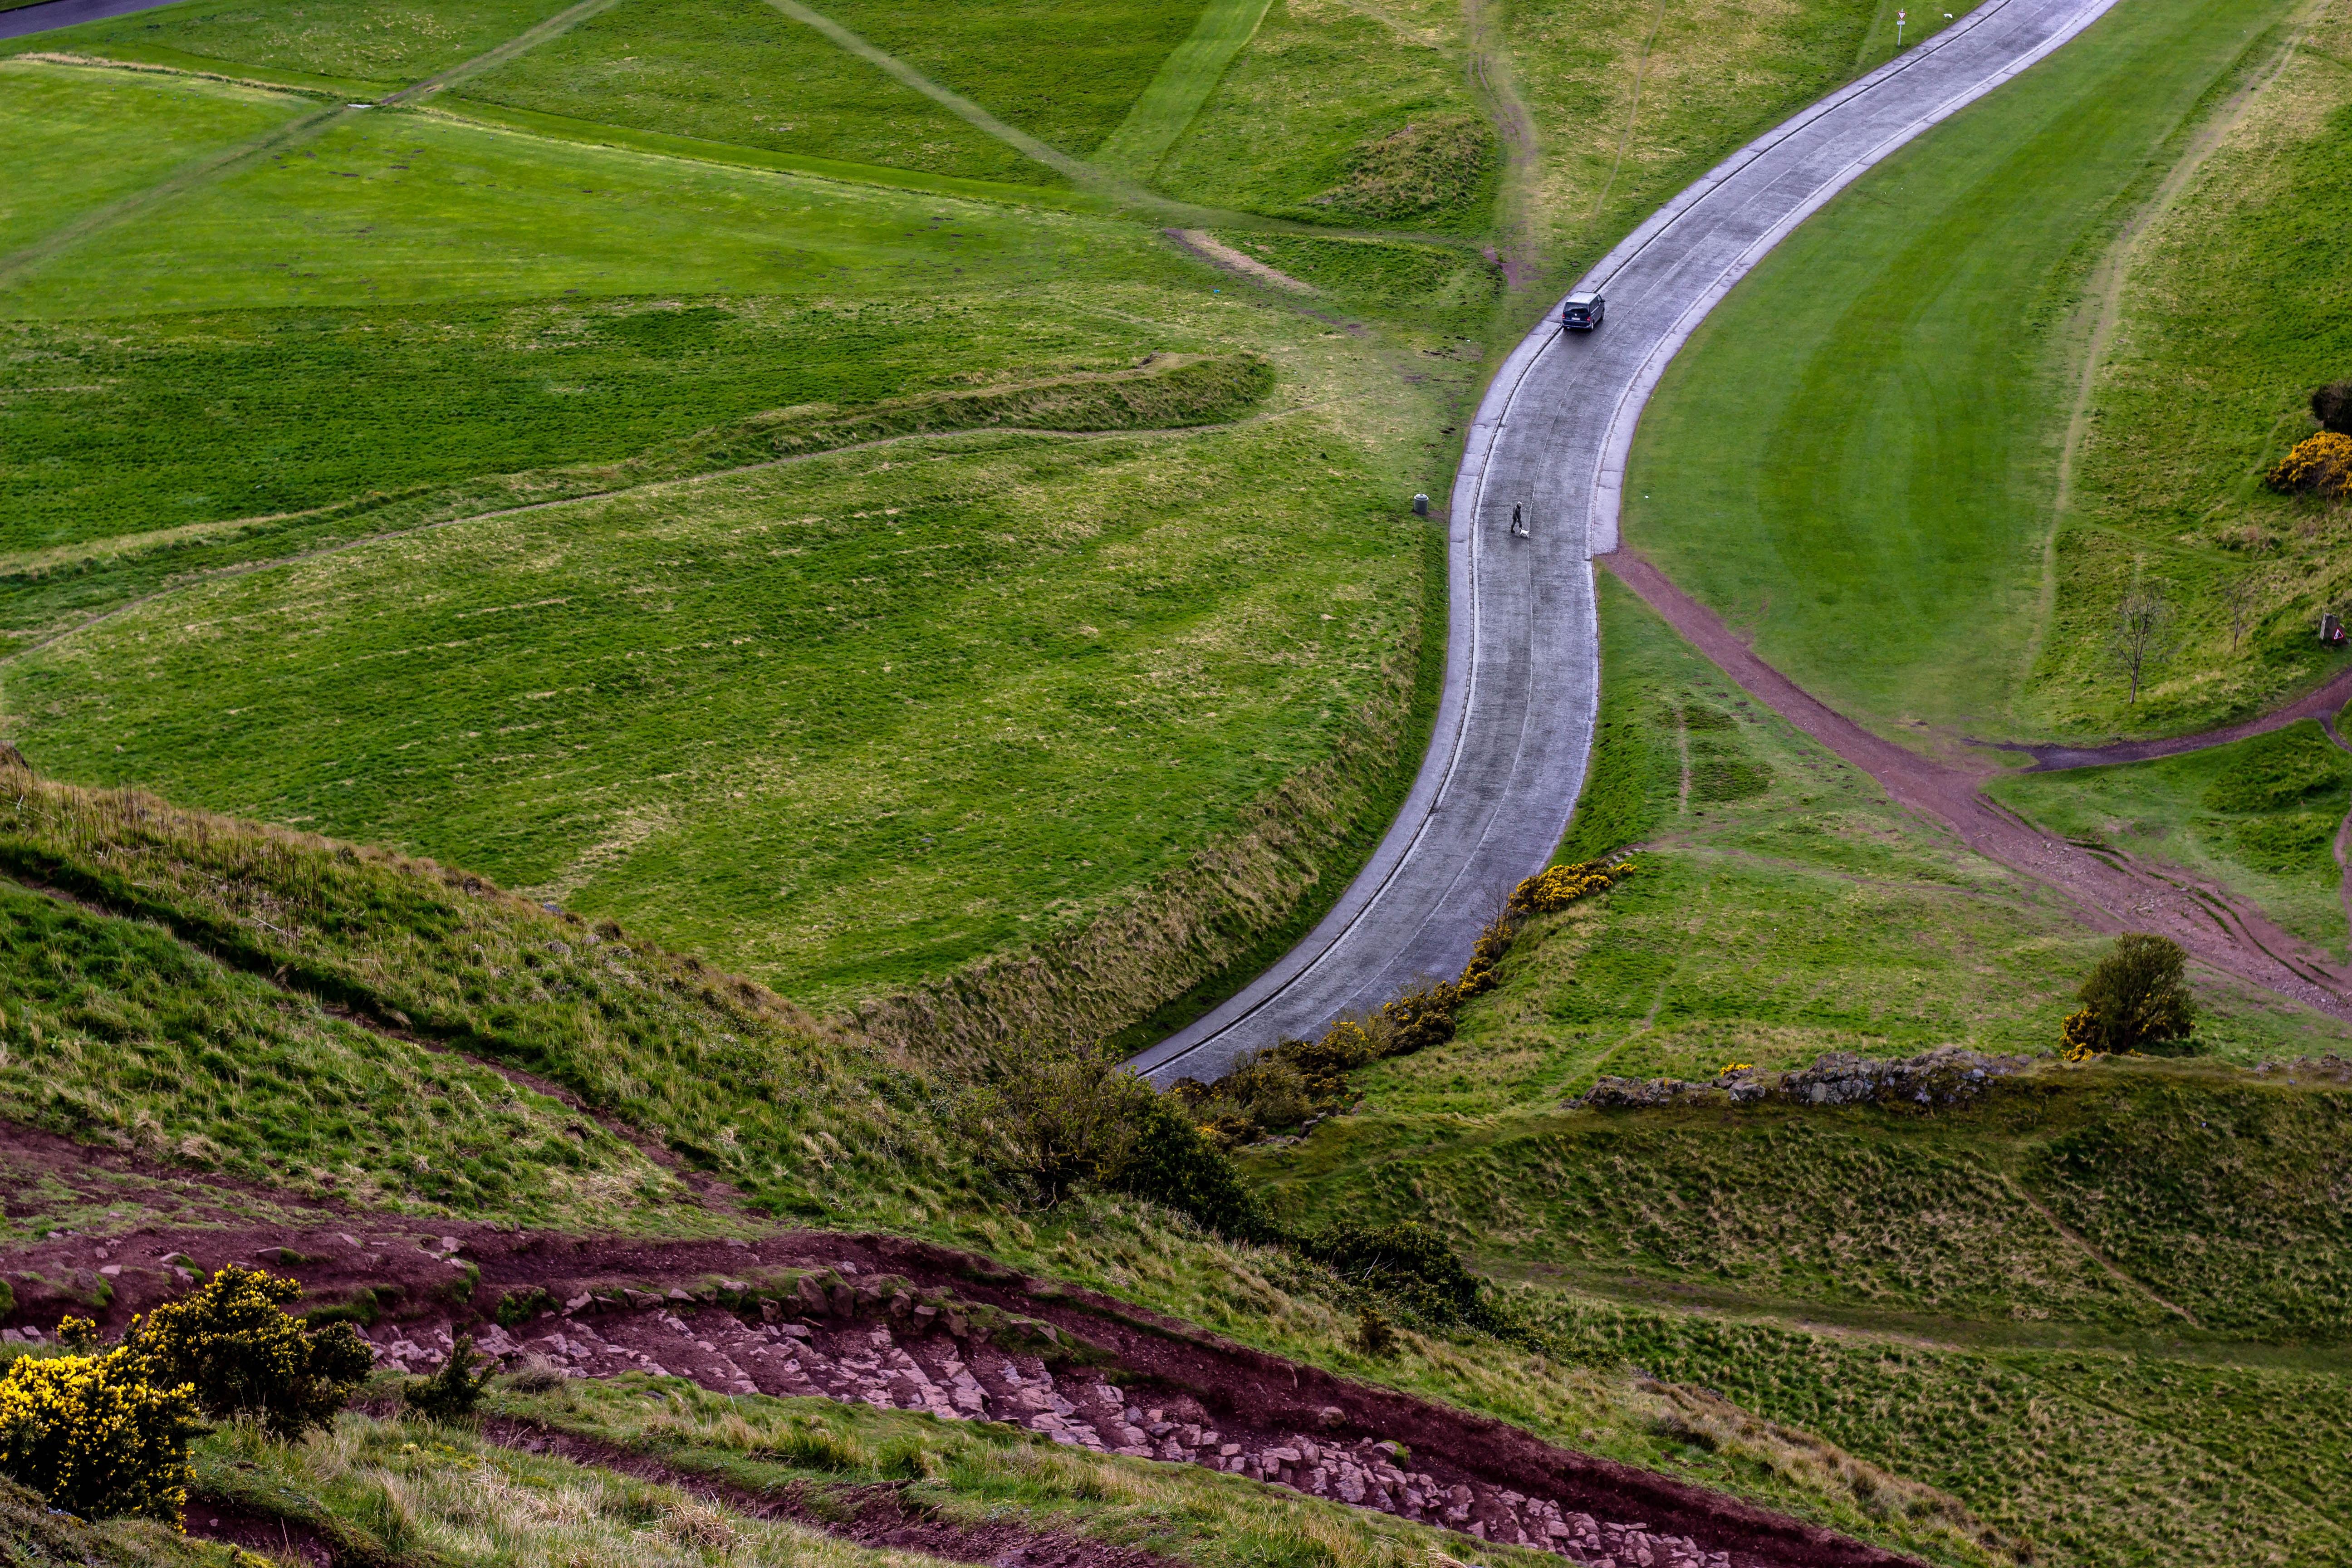 winding road near green grass field